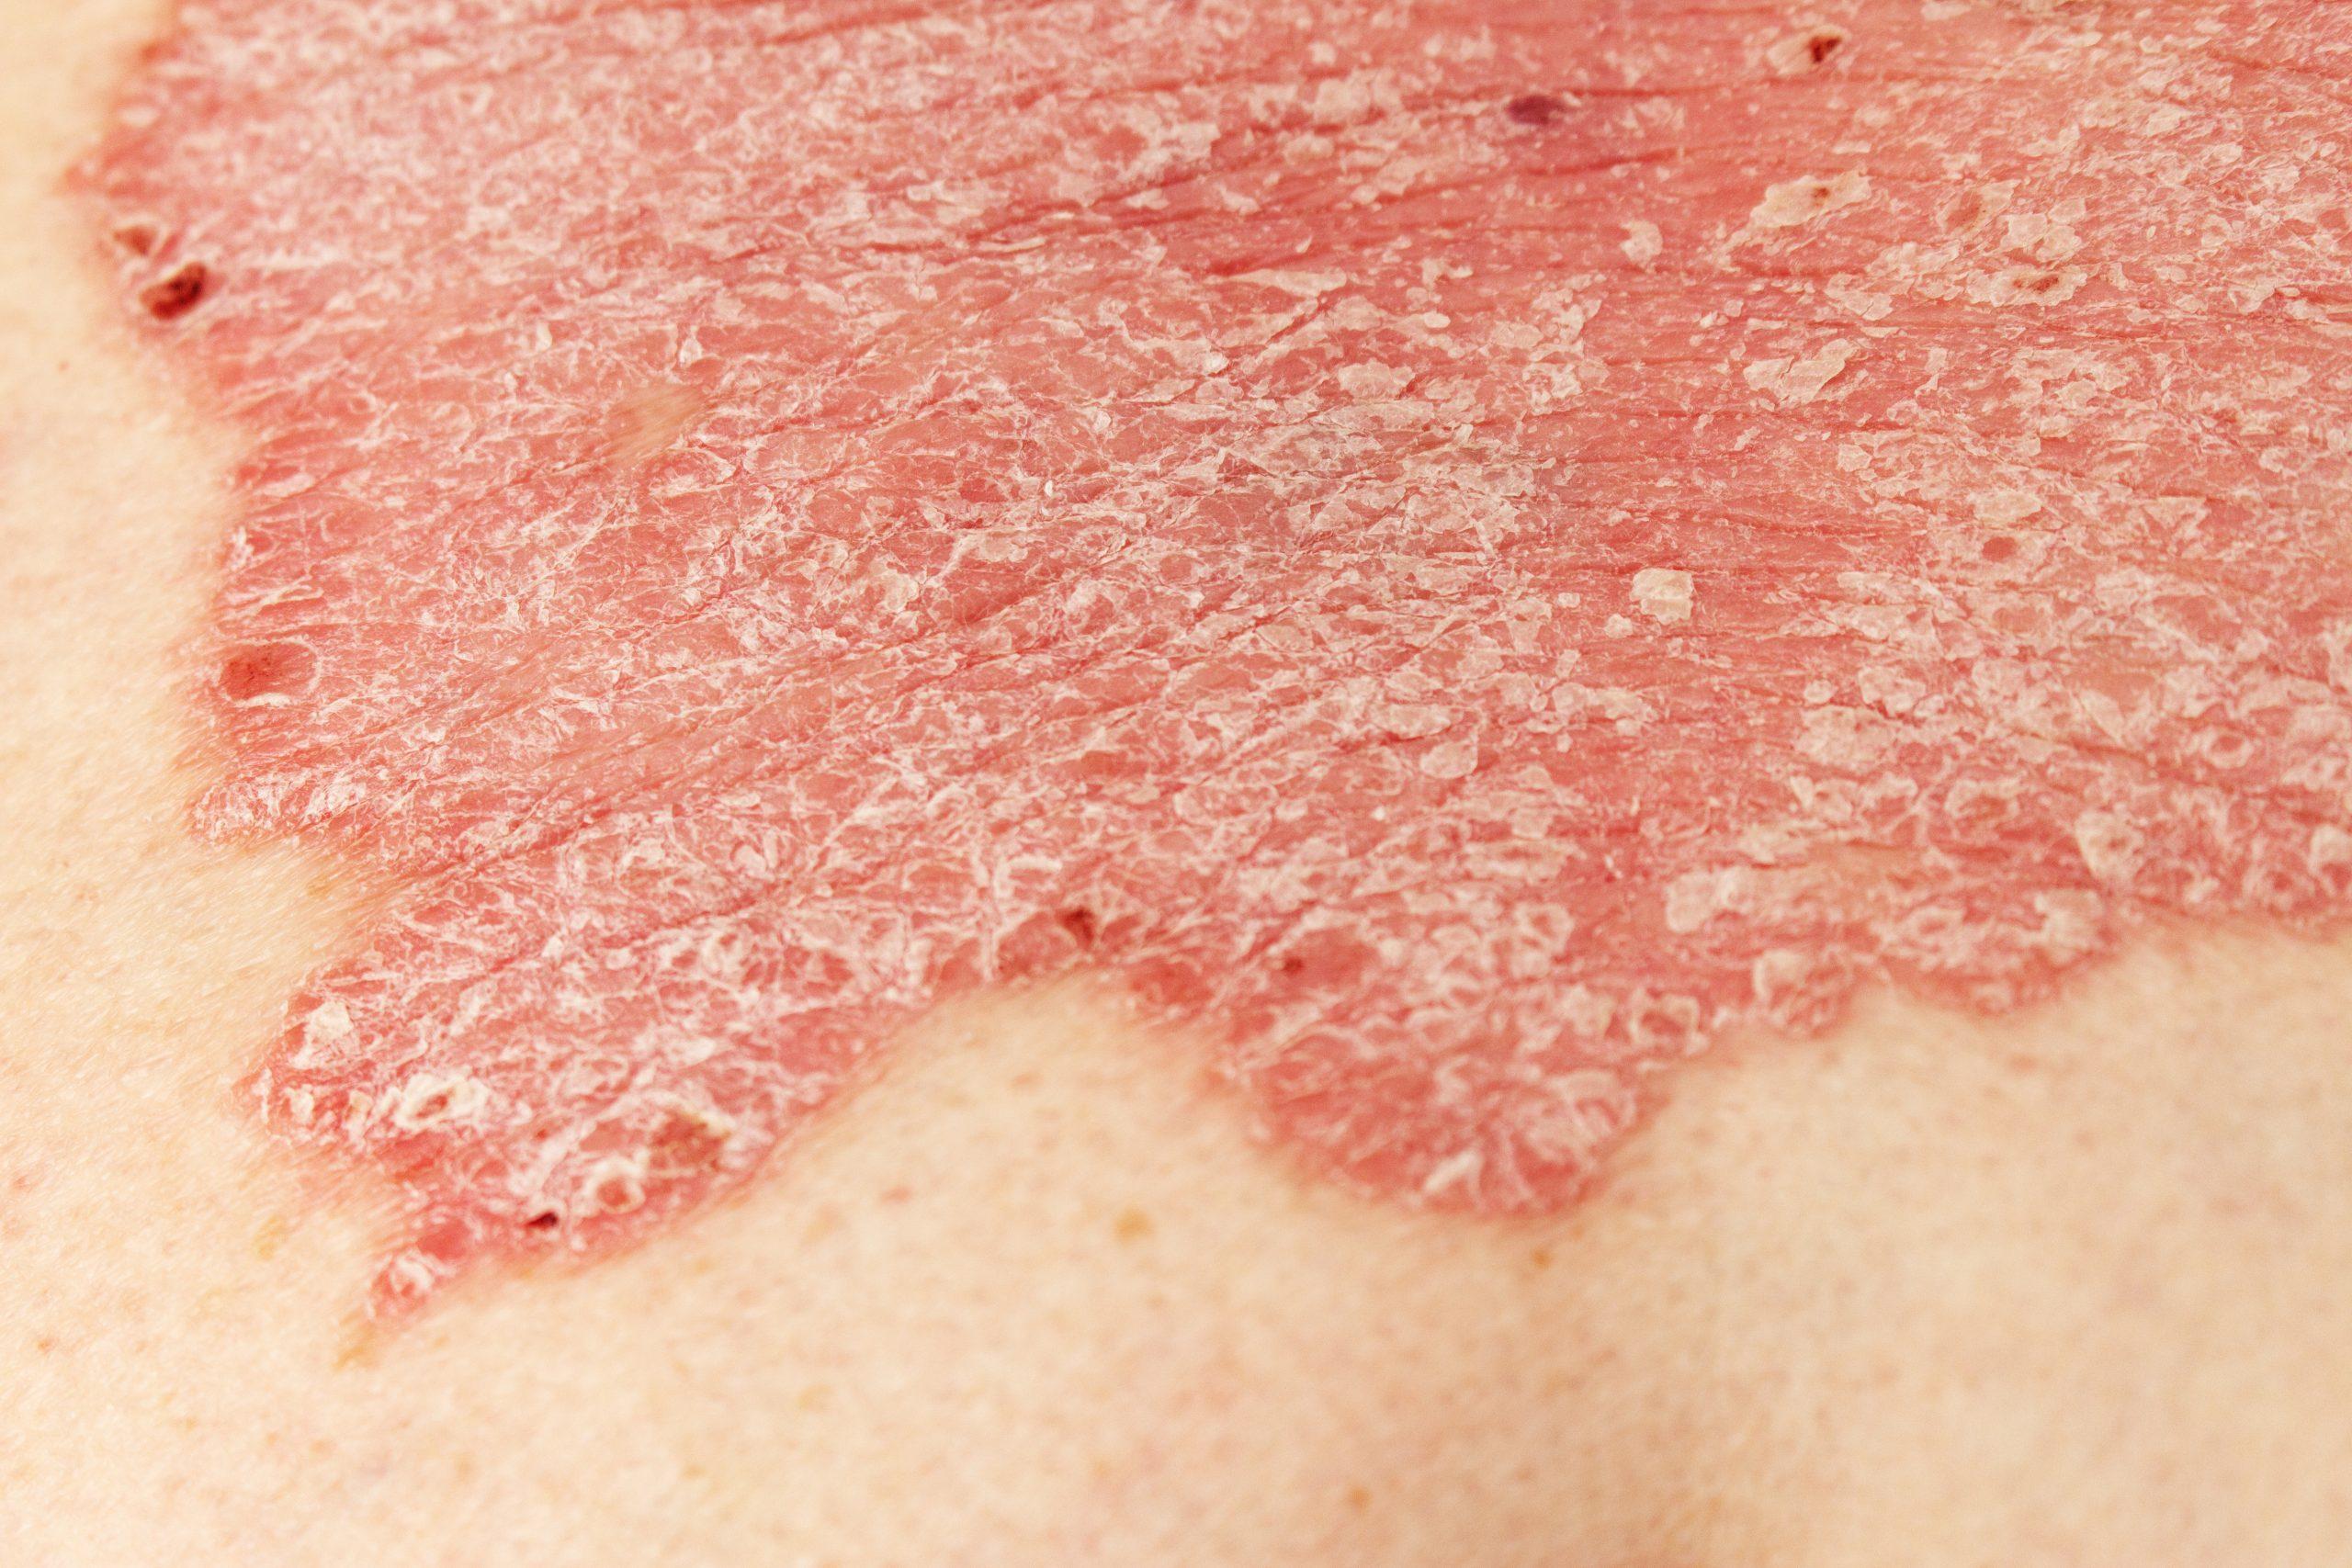 Psoriasis – Types of psoriasis